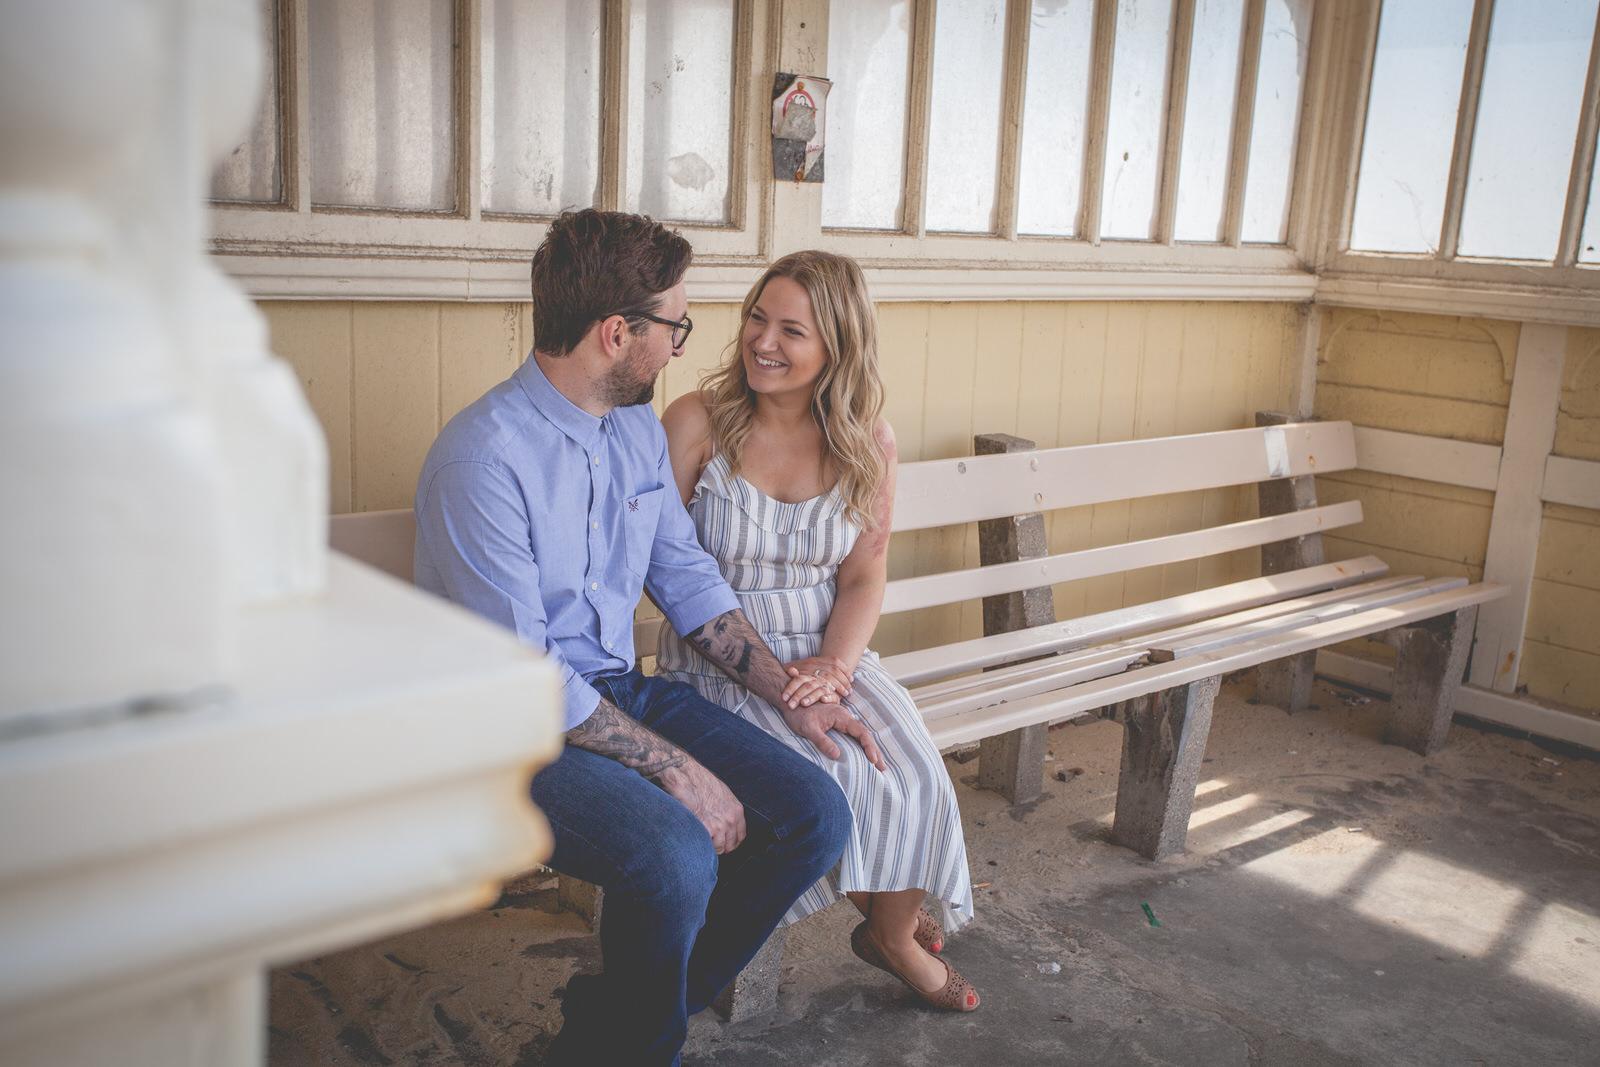 Felixstowe Beachfront Engagement - Sinead  Ryan - 041.jpg